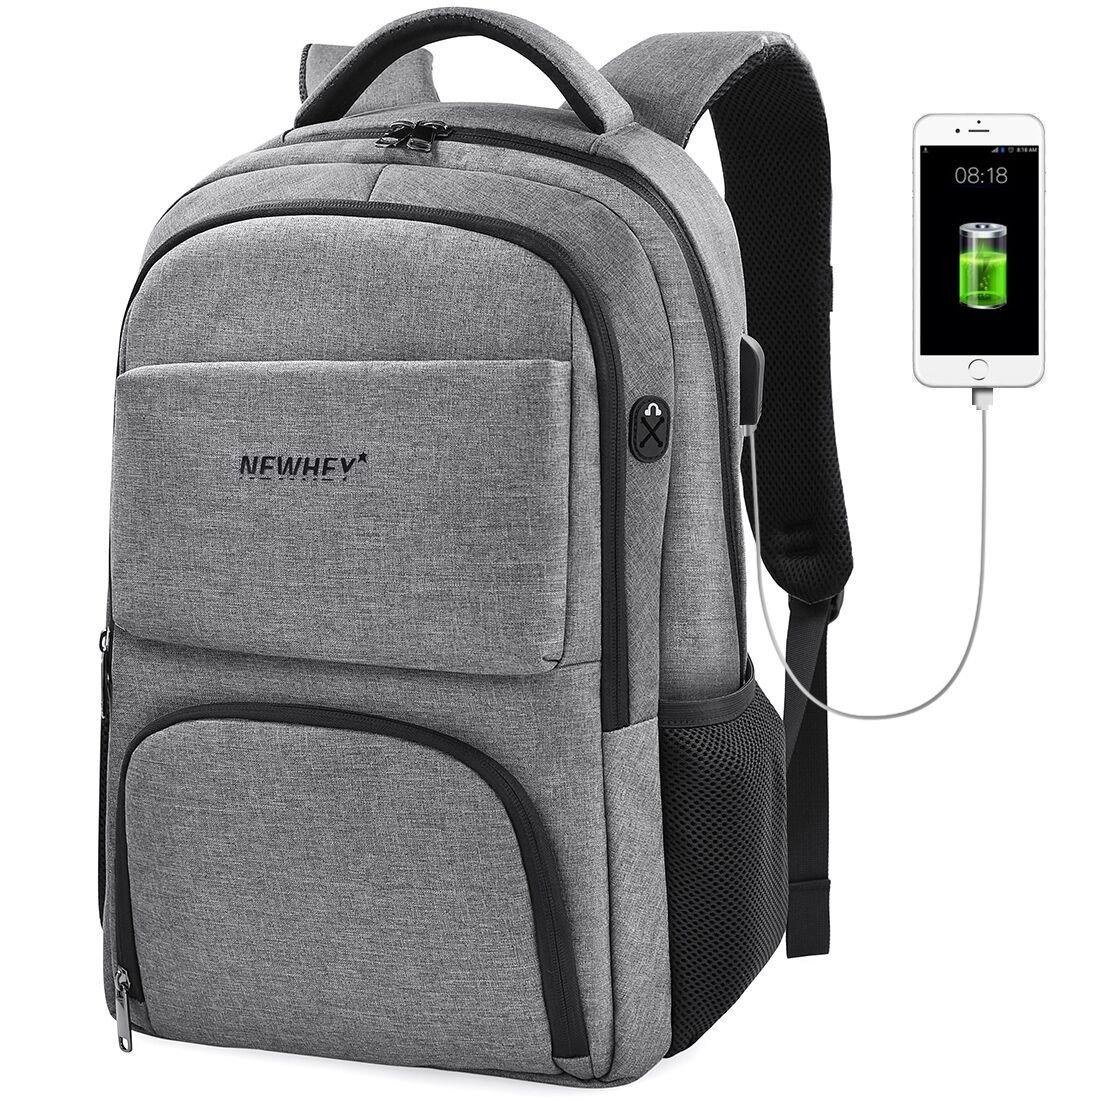 80%OFF Laptop Backpack Business Anti Theft Computer Bag Water Resistant School College Backpack USB Charging Port Lightweight Backpacks Fits Under 17 Inch Laptop for Men Women Grey